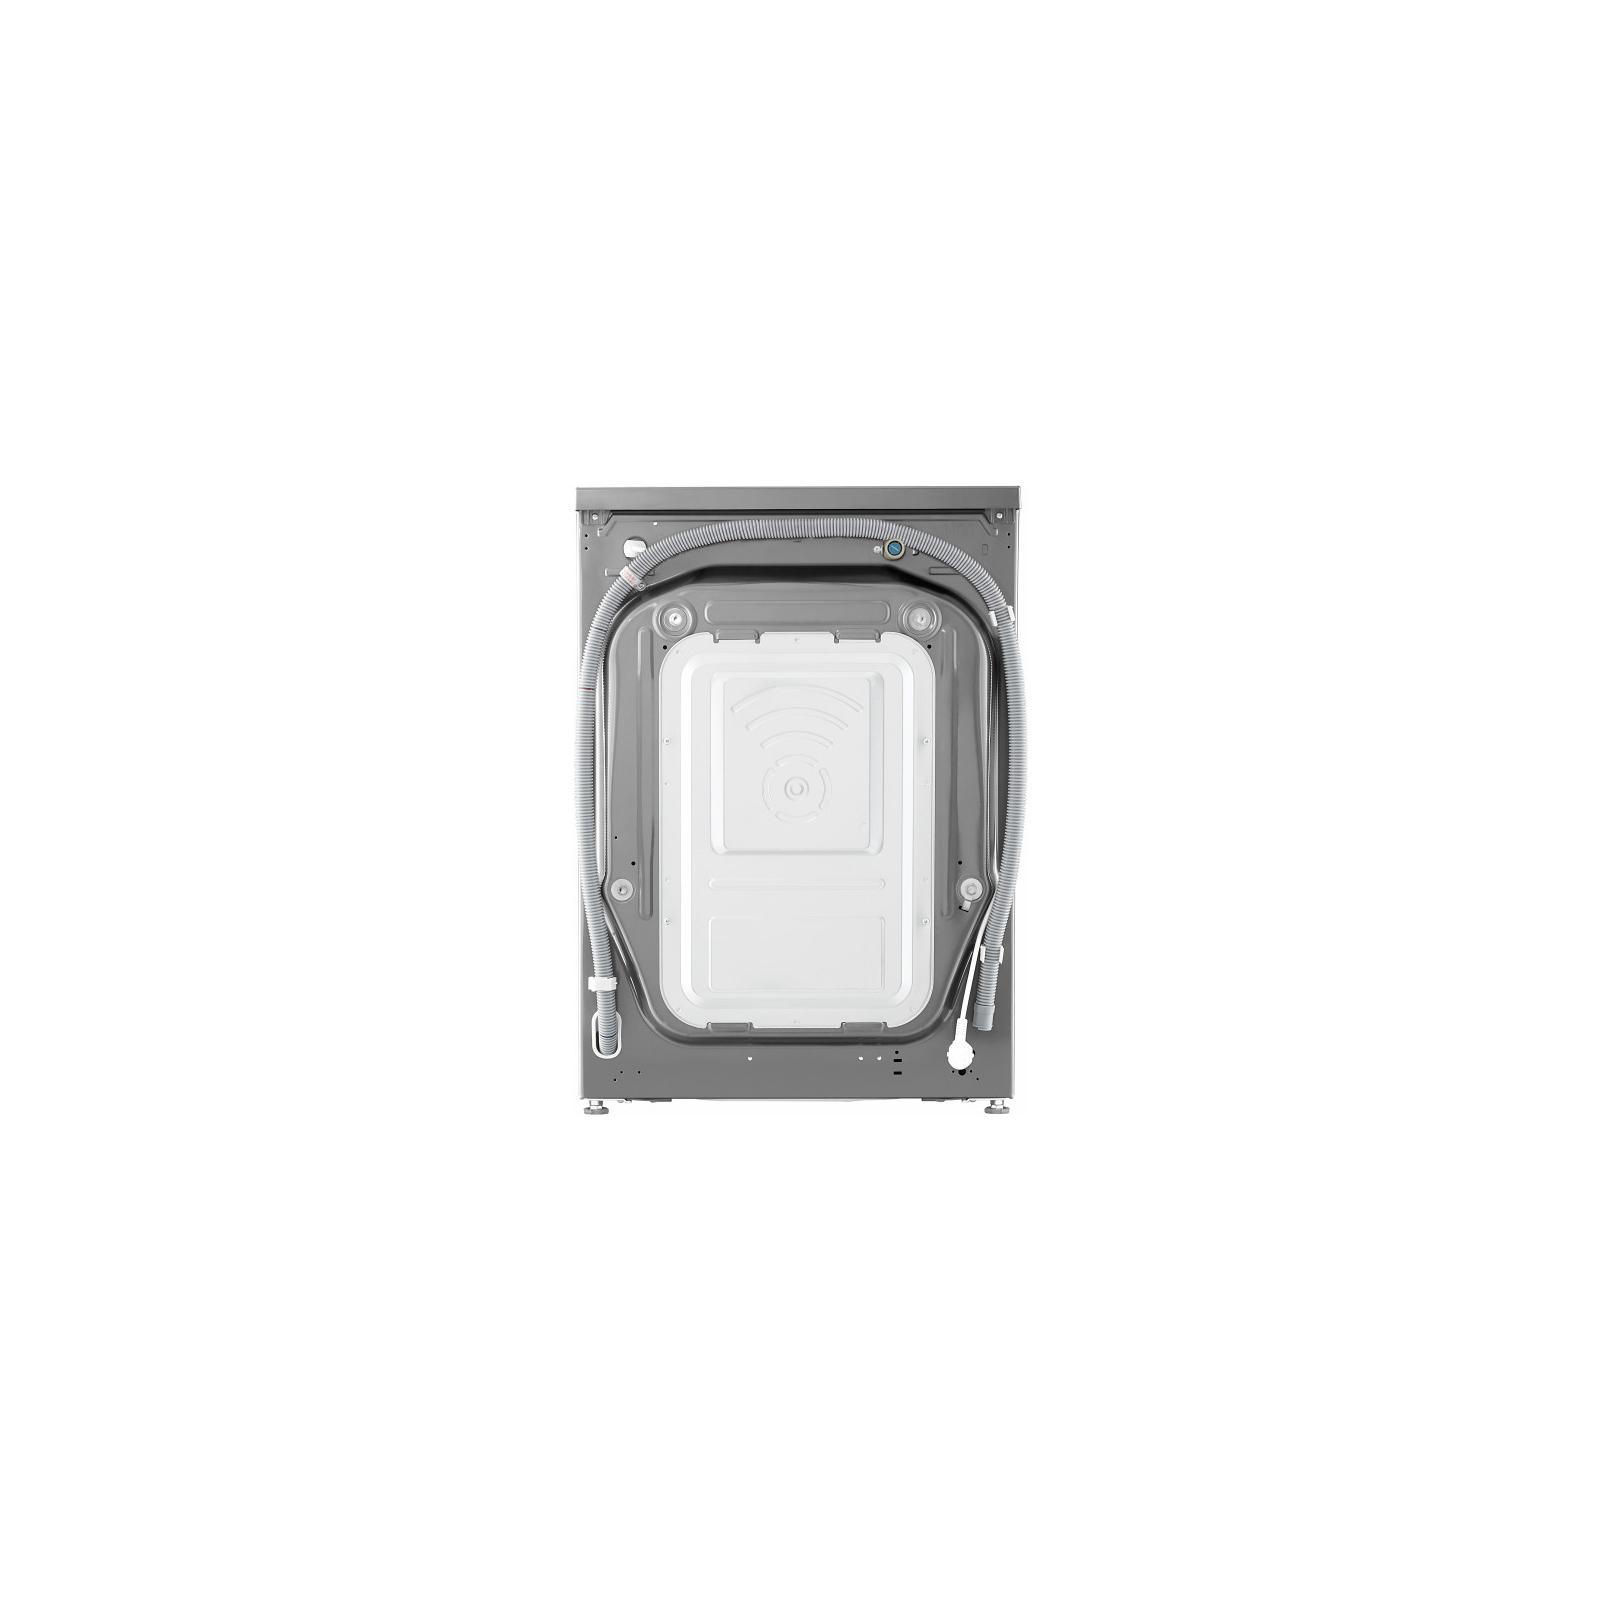 Стиральная машина LG F4V7VW9T изображение 2